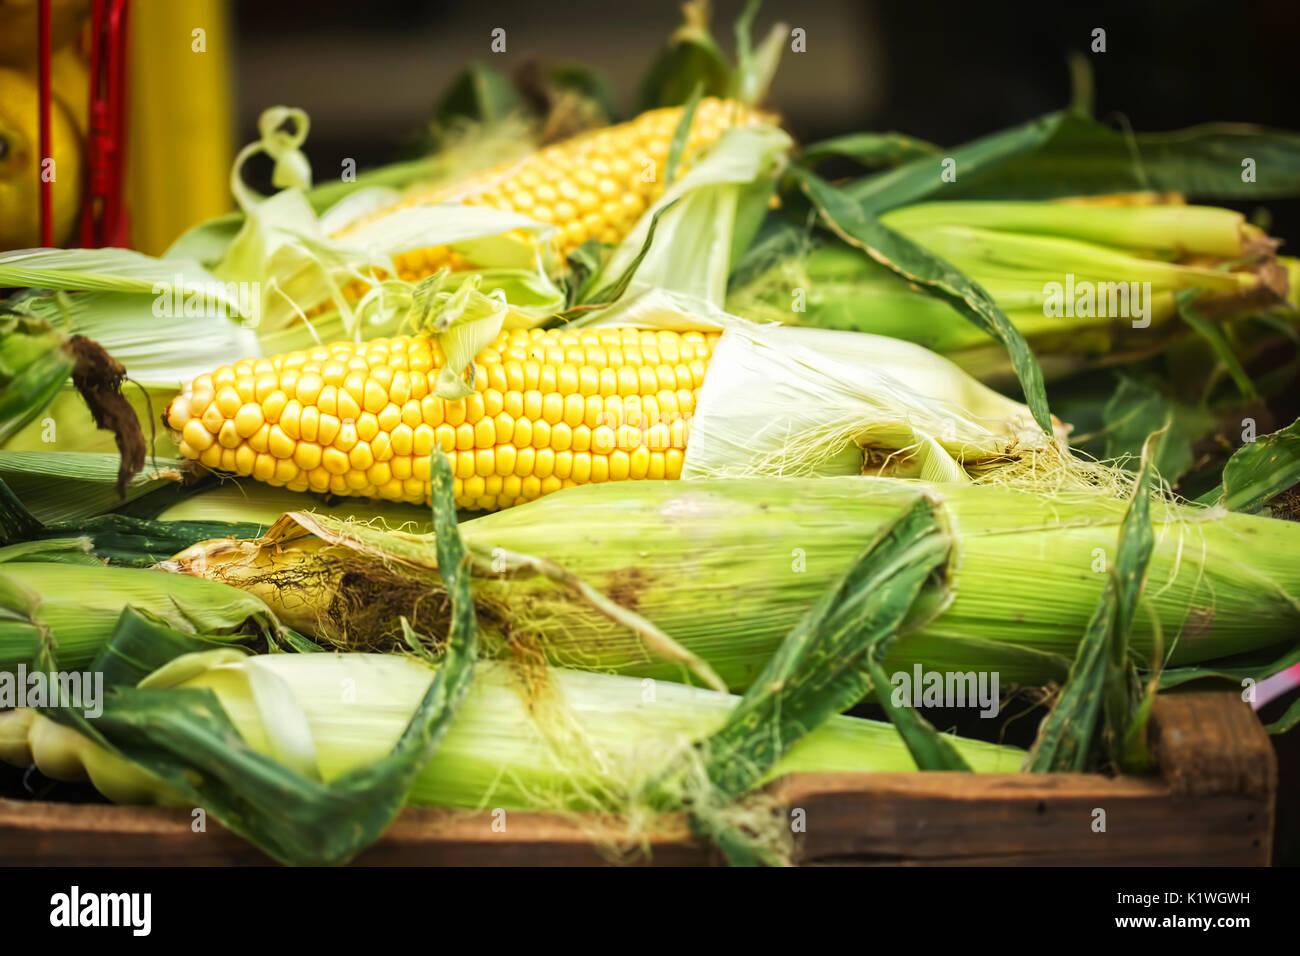 Corn on the cob, street market harvest - Stock Image